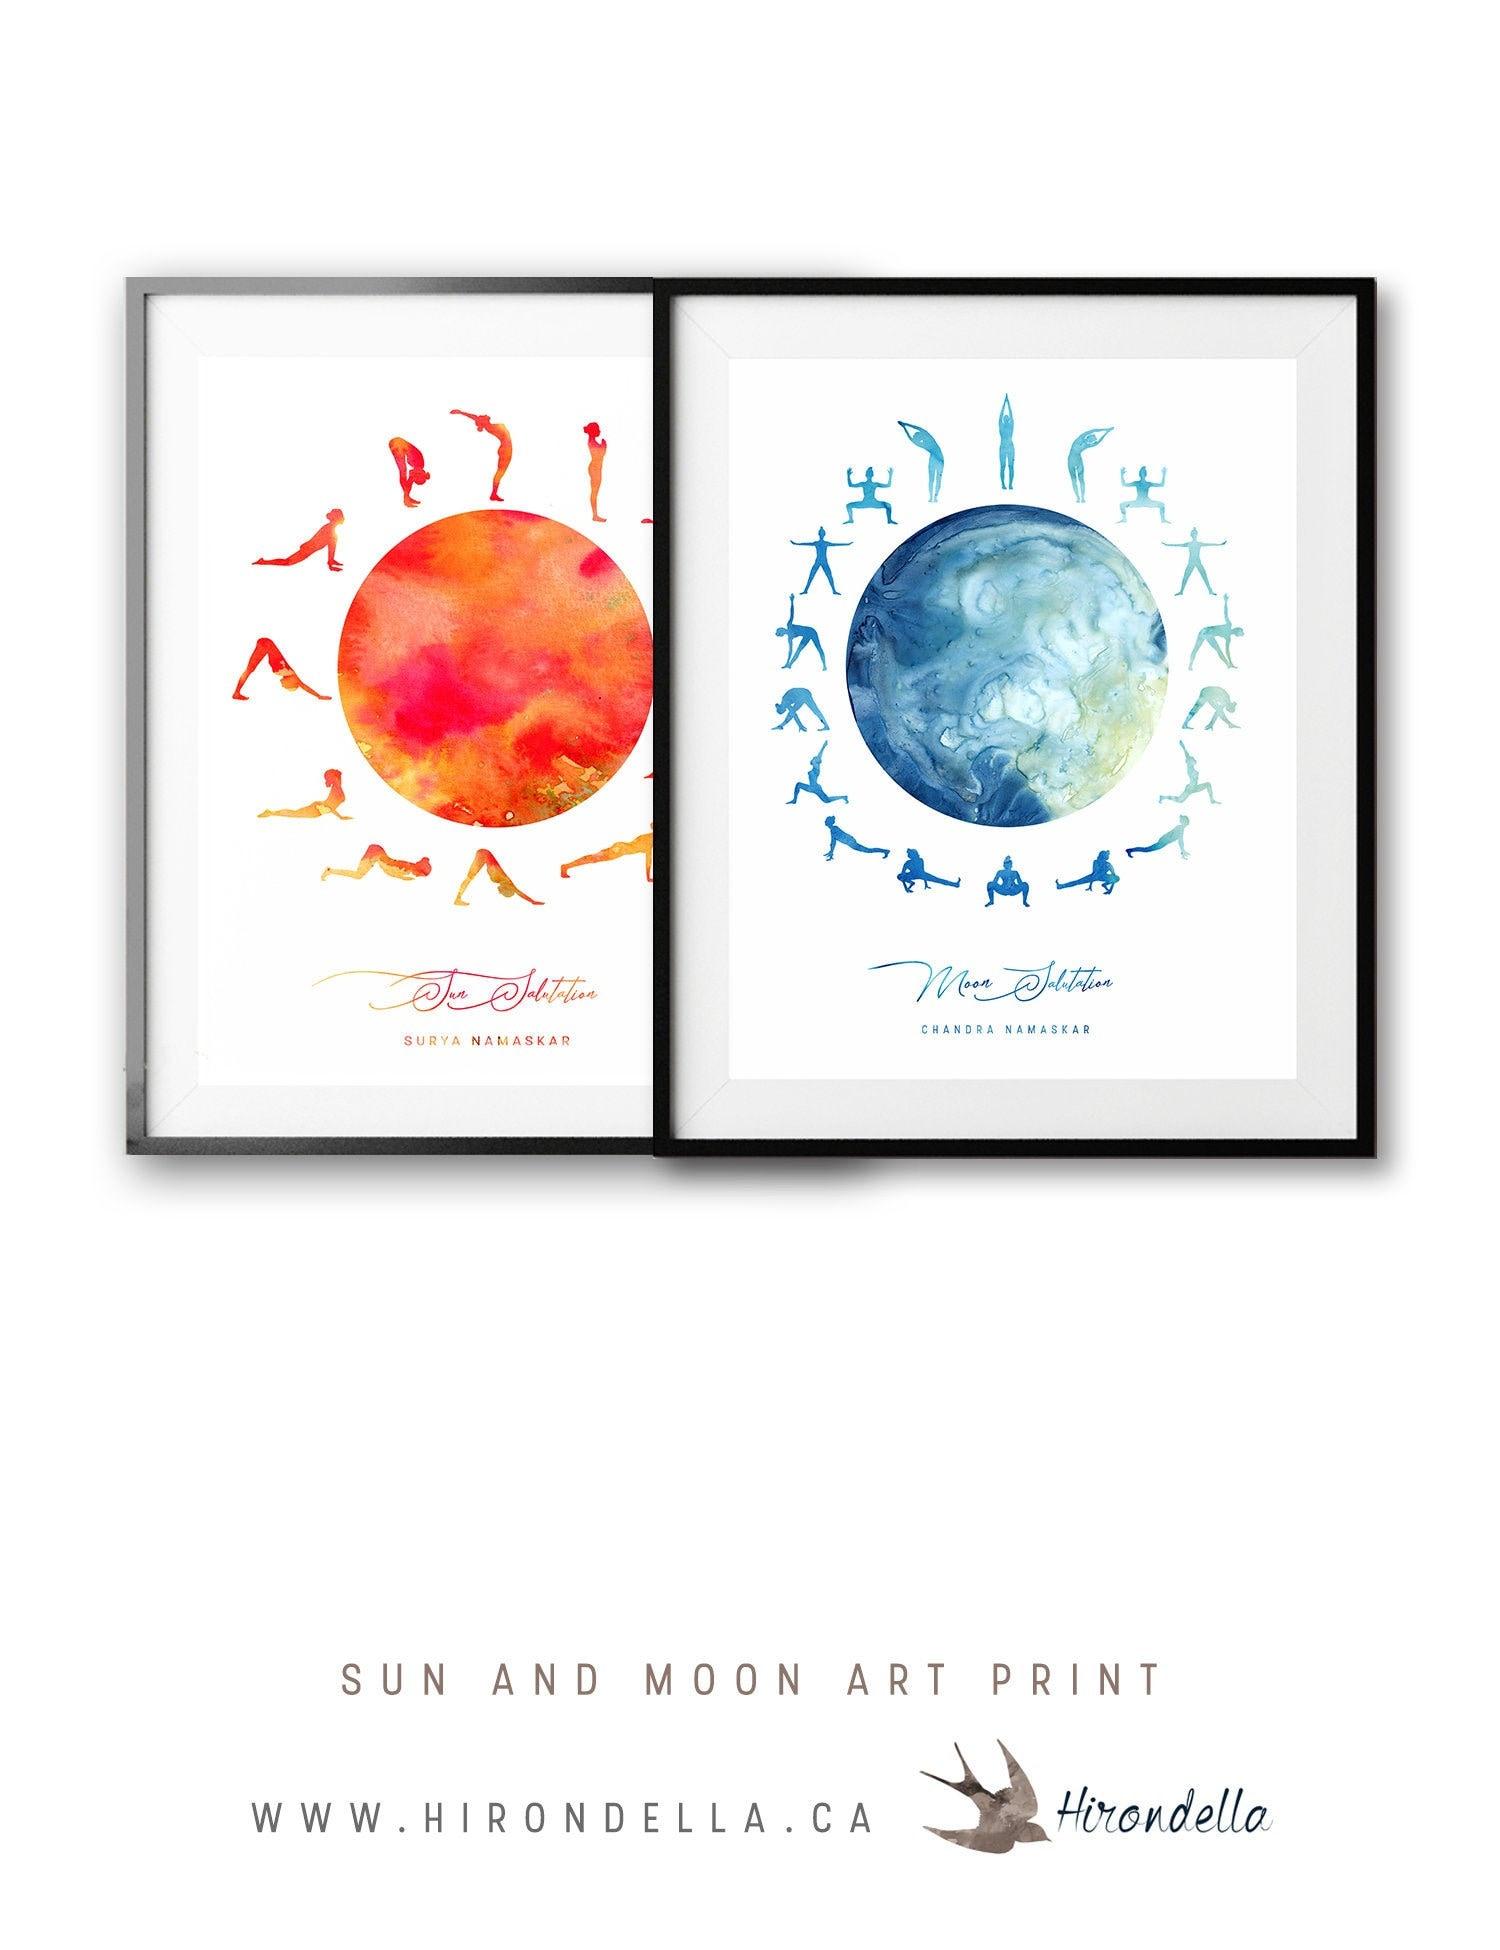 Sun and Moon Salutation Yoga Boho Decor, yoga pose poster, Meditation  Studio Wall Art Mountain Pose Sanskrit Namaskar, spiritual gifts